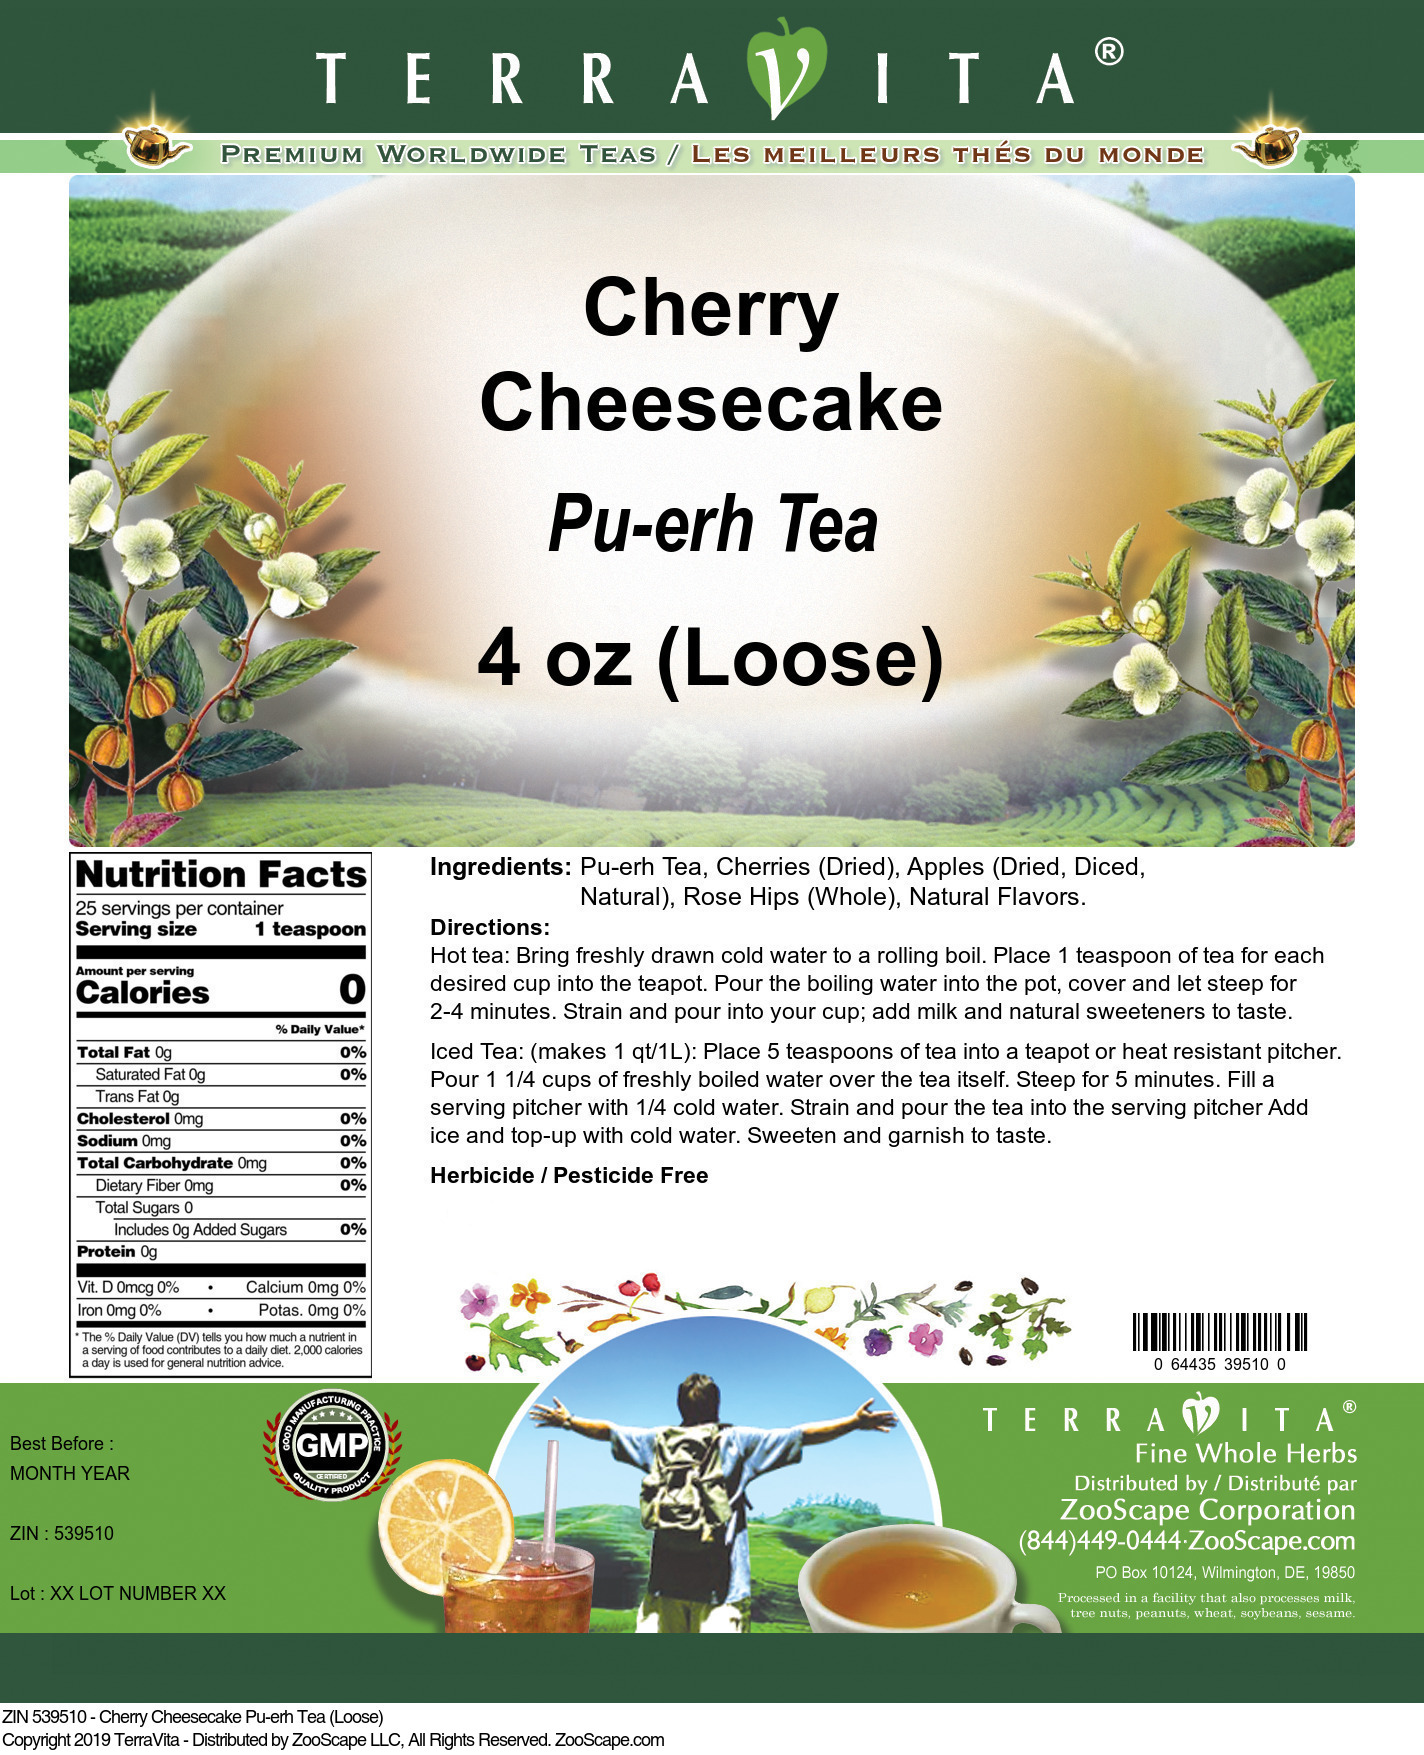 Cherry Cheesecake Pu-erh Tea